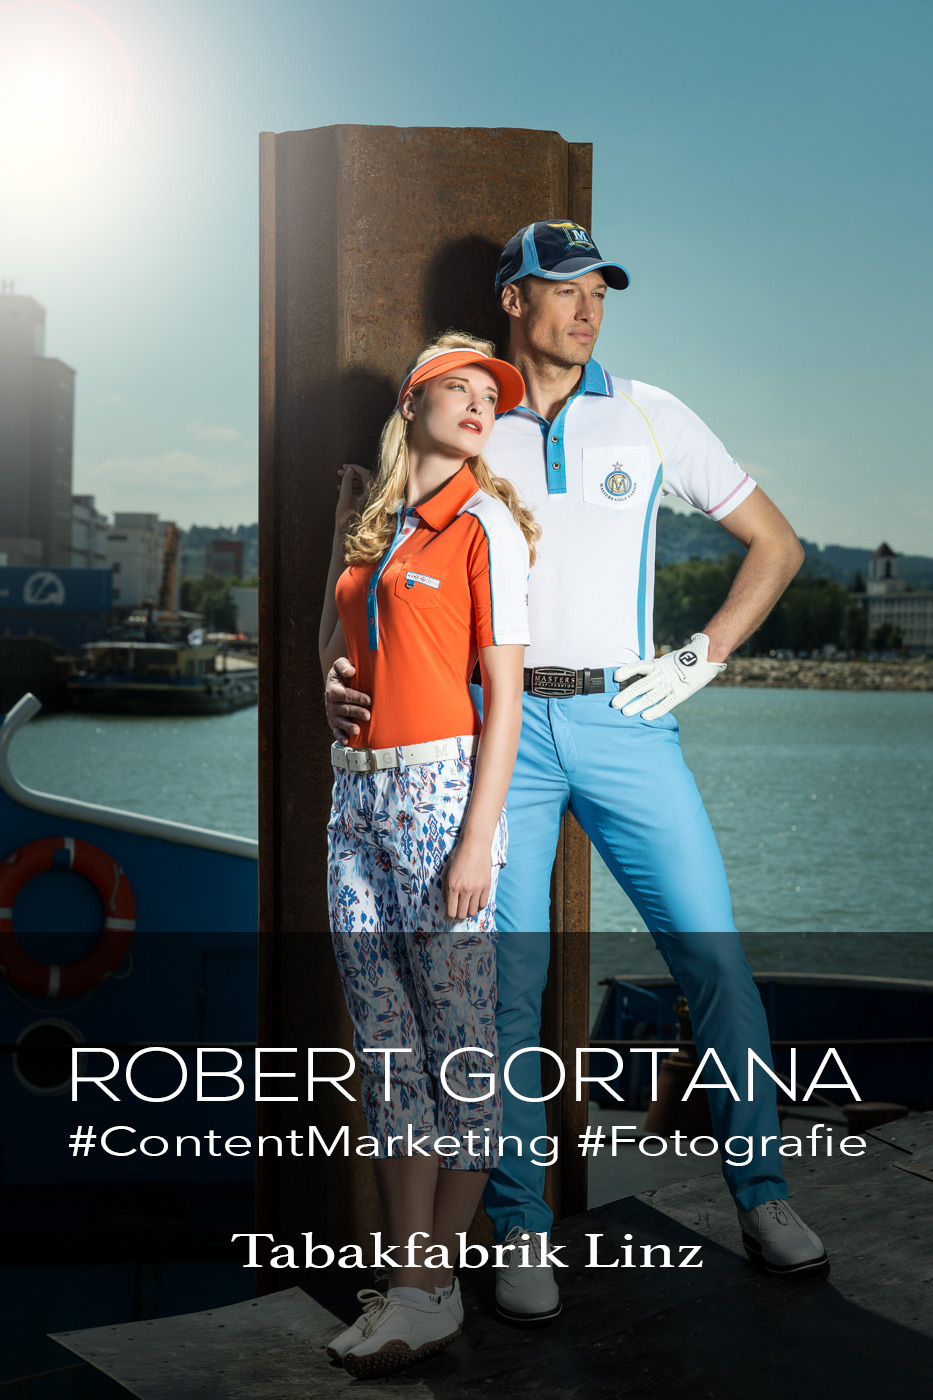 robert_gortana_tabakfabrik_linz_v2